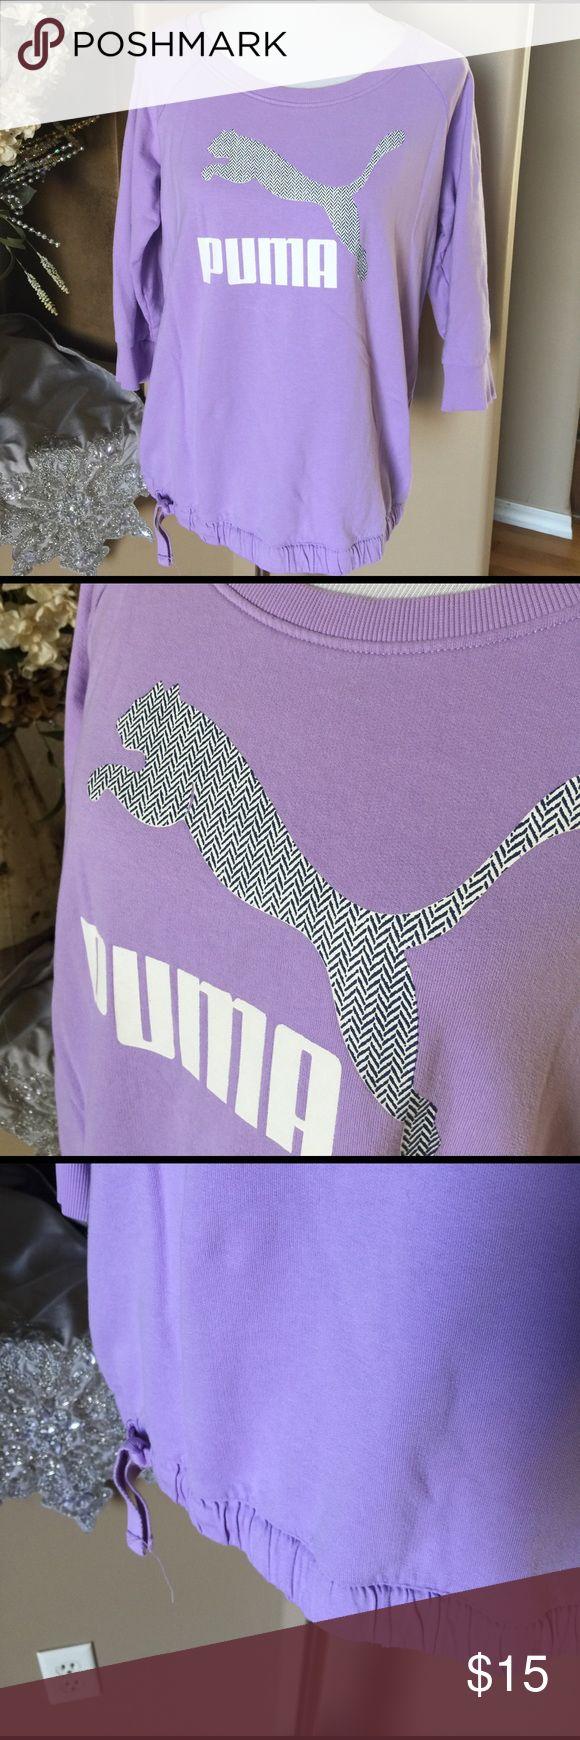 Lavender three-quarter sleeve Puma sweatshirt Drawstring waist. 88% cotton 12% polyester. SD Puma Tops Sweatshirts & Hoodies